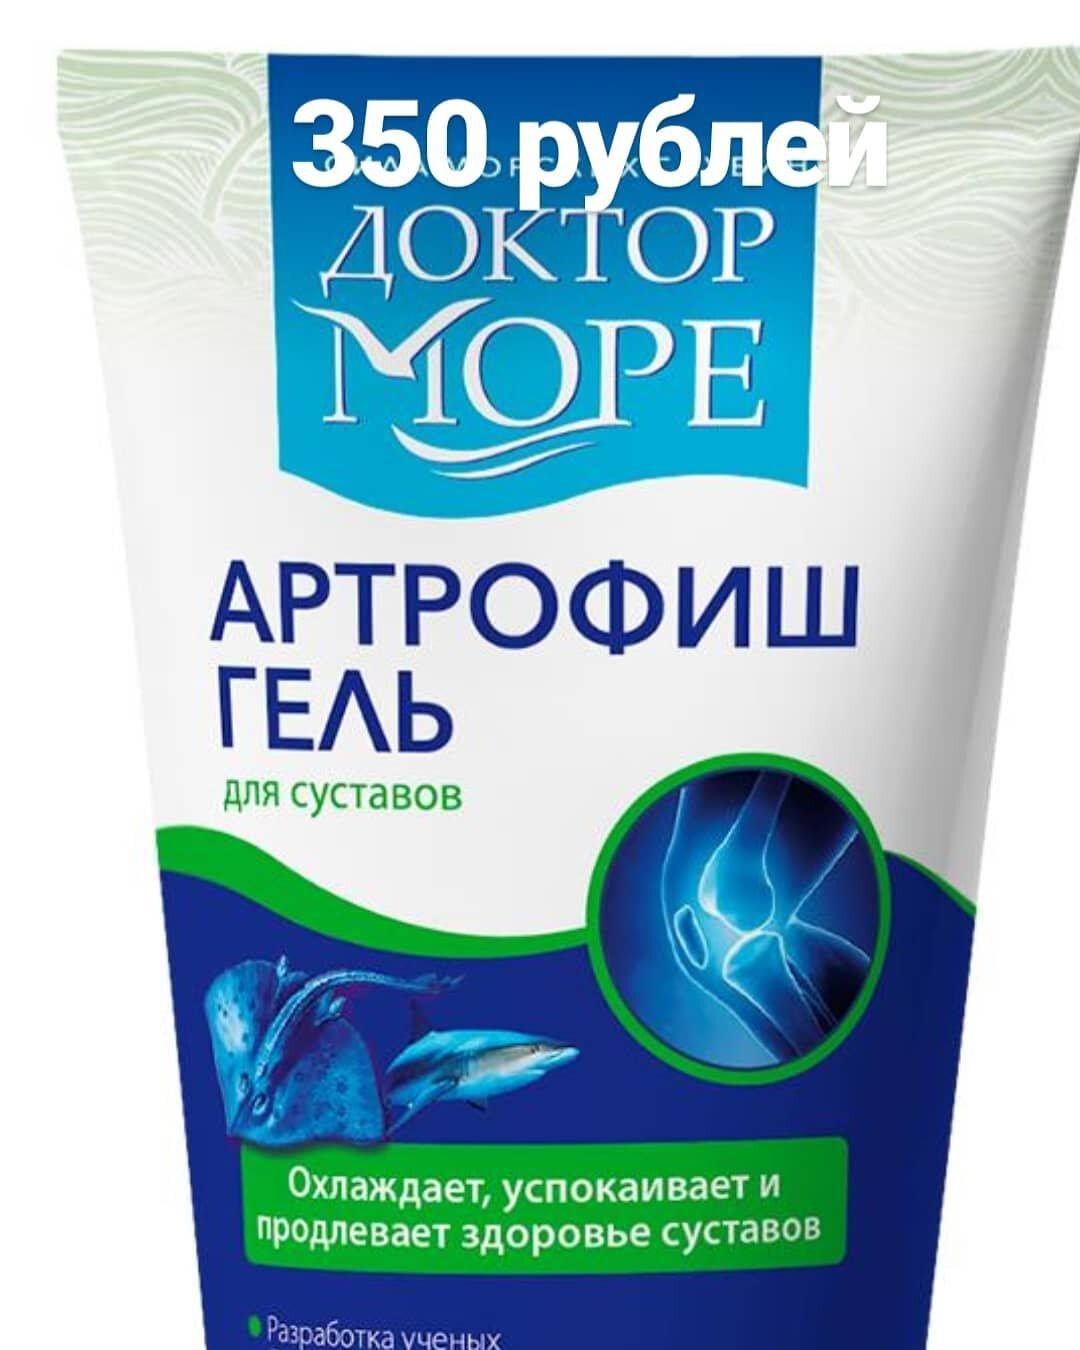 Артрофиш для лечения суставов в Северодонецке